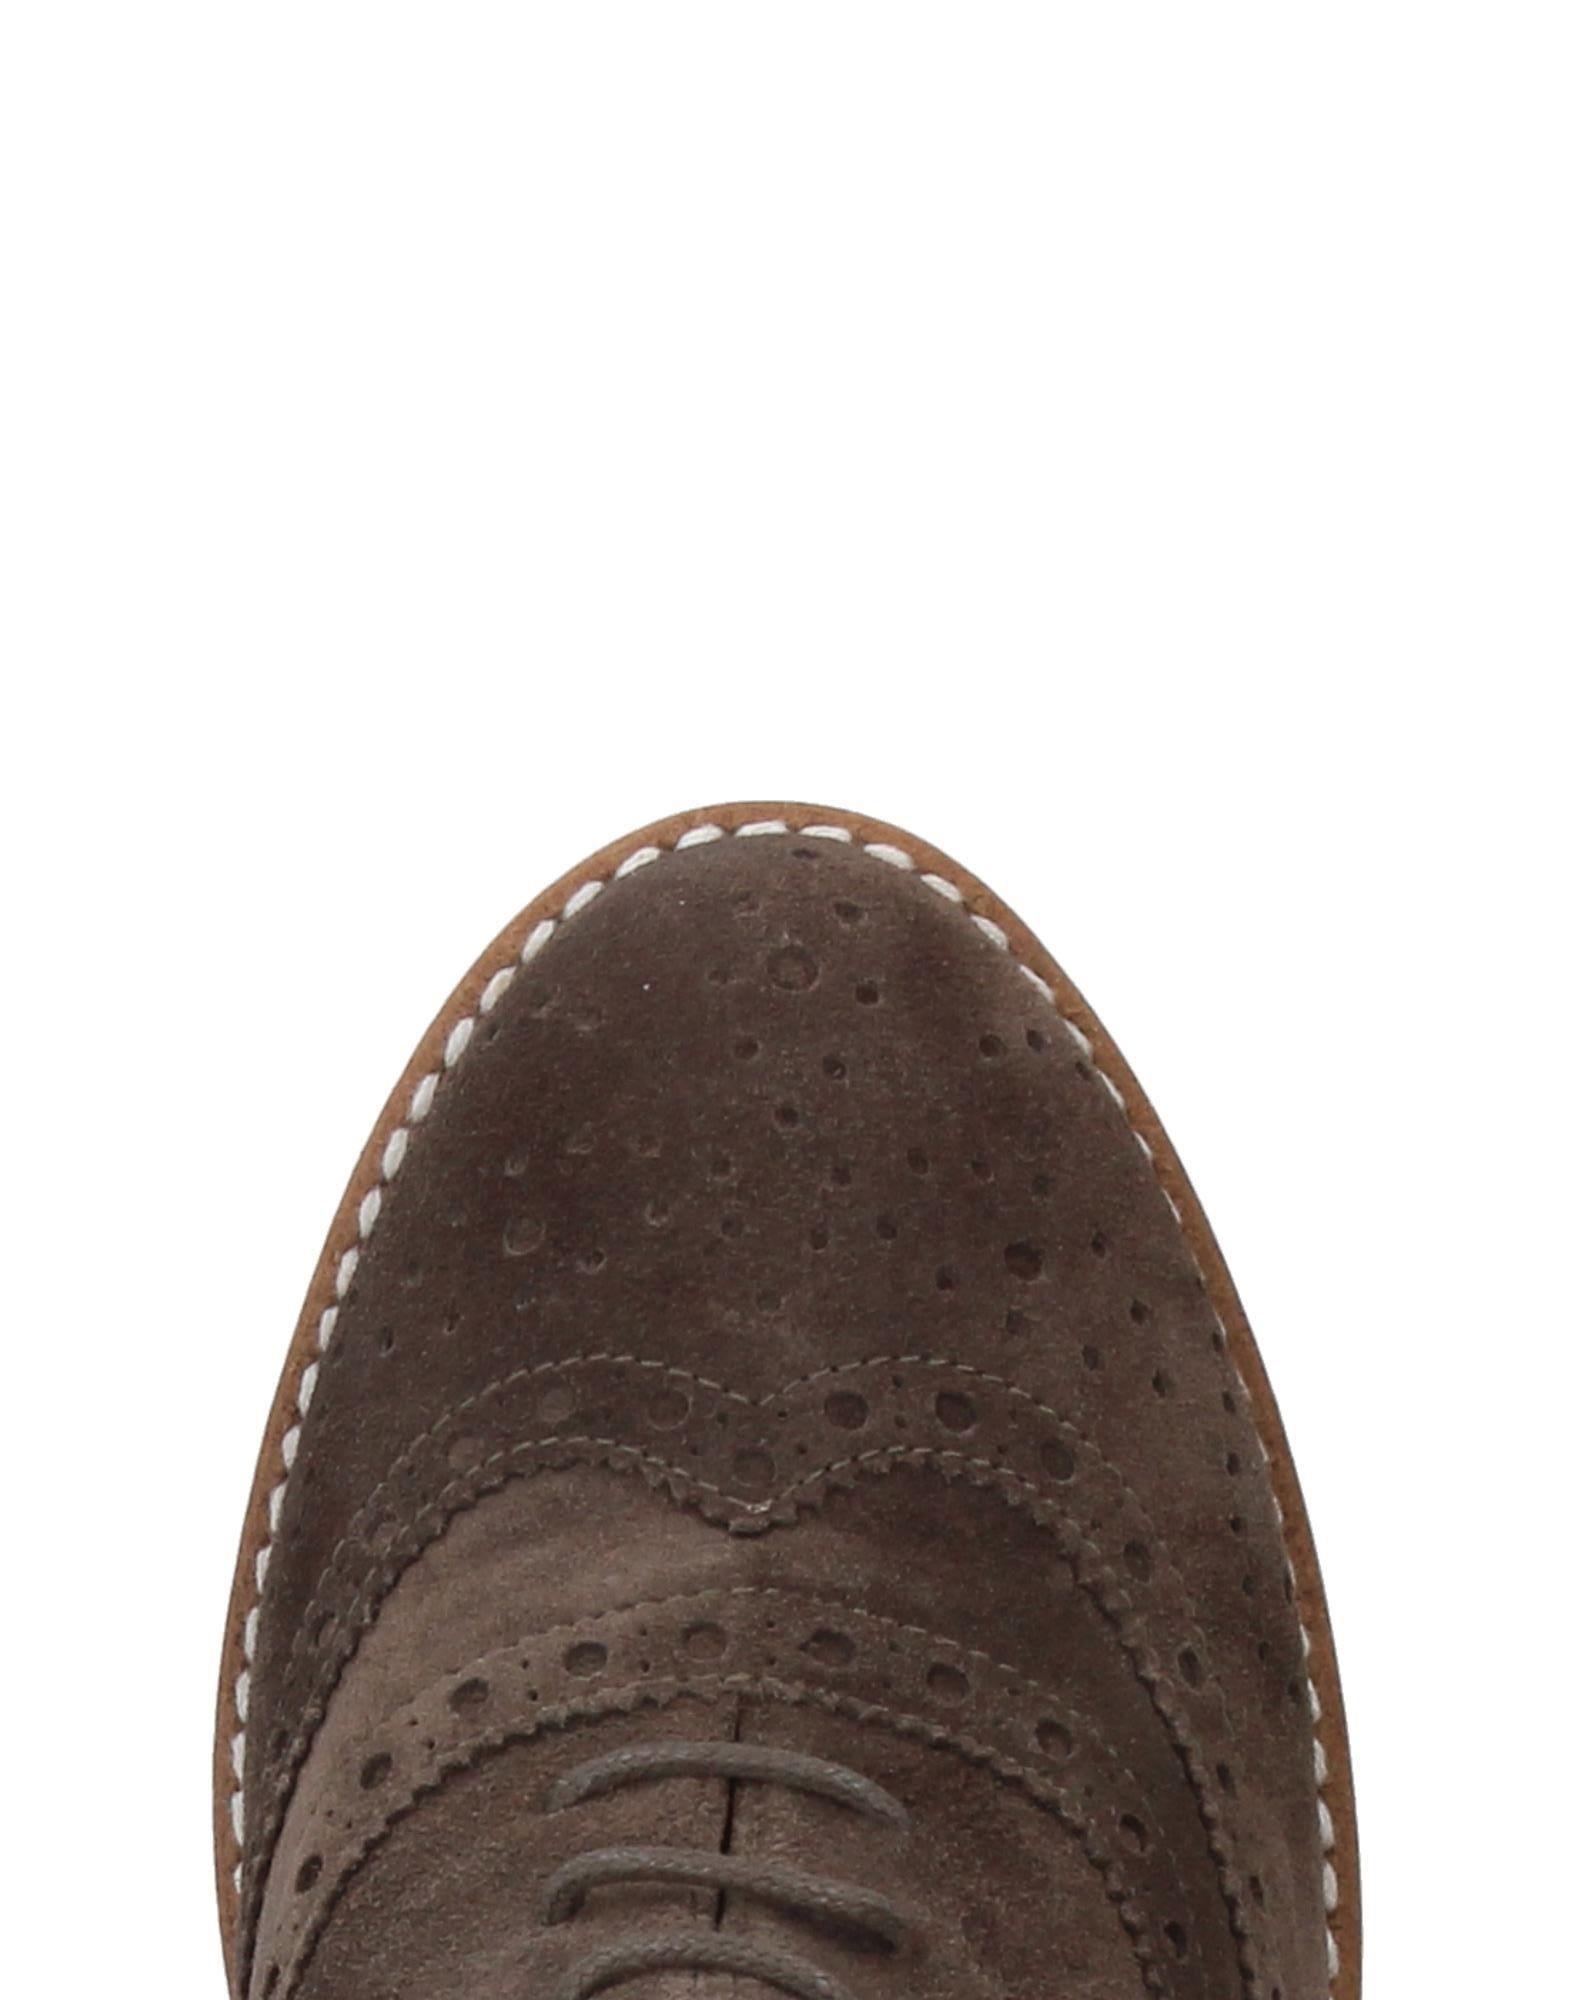 Gut um billige Schnürschuhe Schuhe zu tragenPaloma Barceló Schnürschuhe billige Damen  11242866RB b2018e